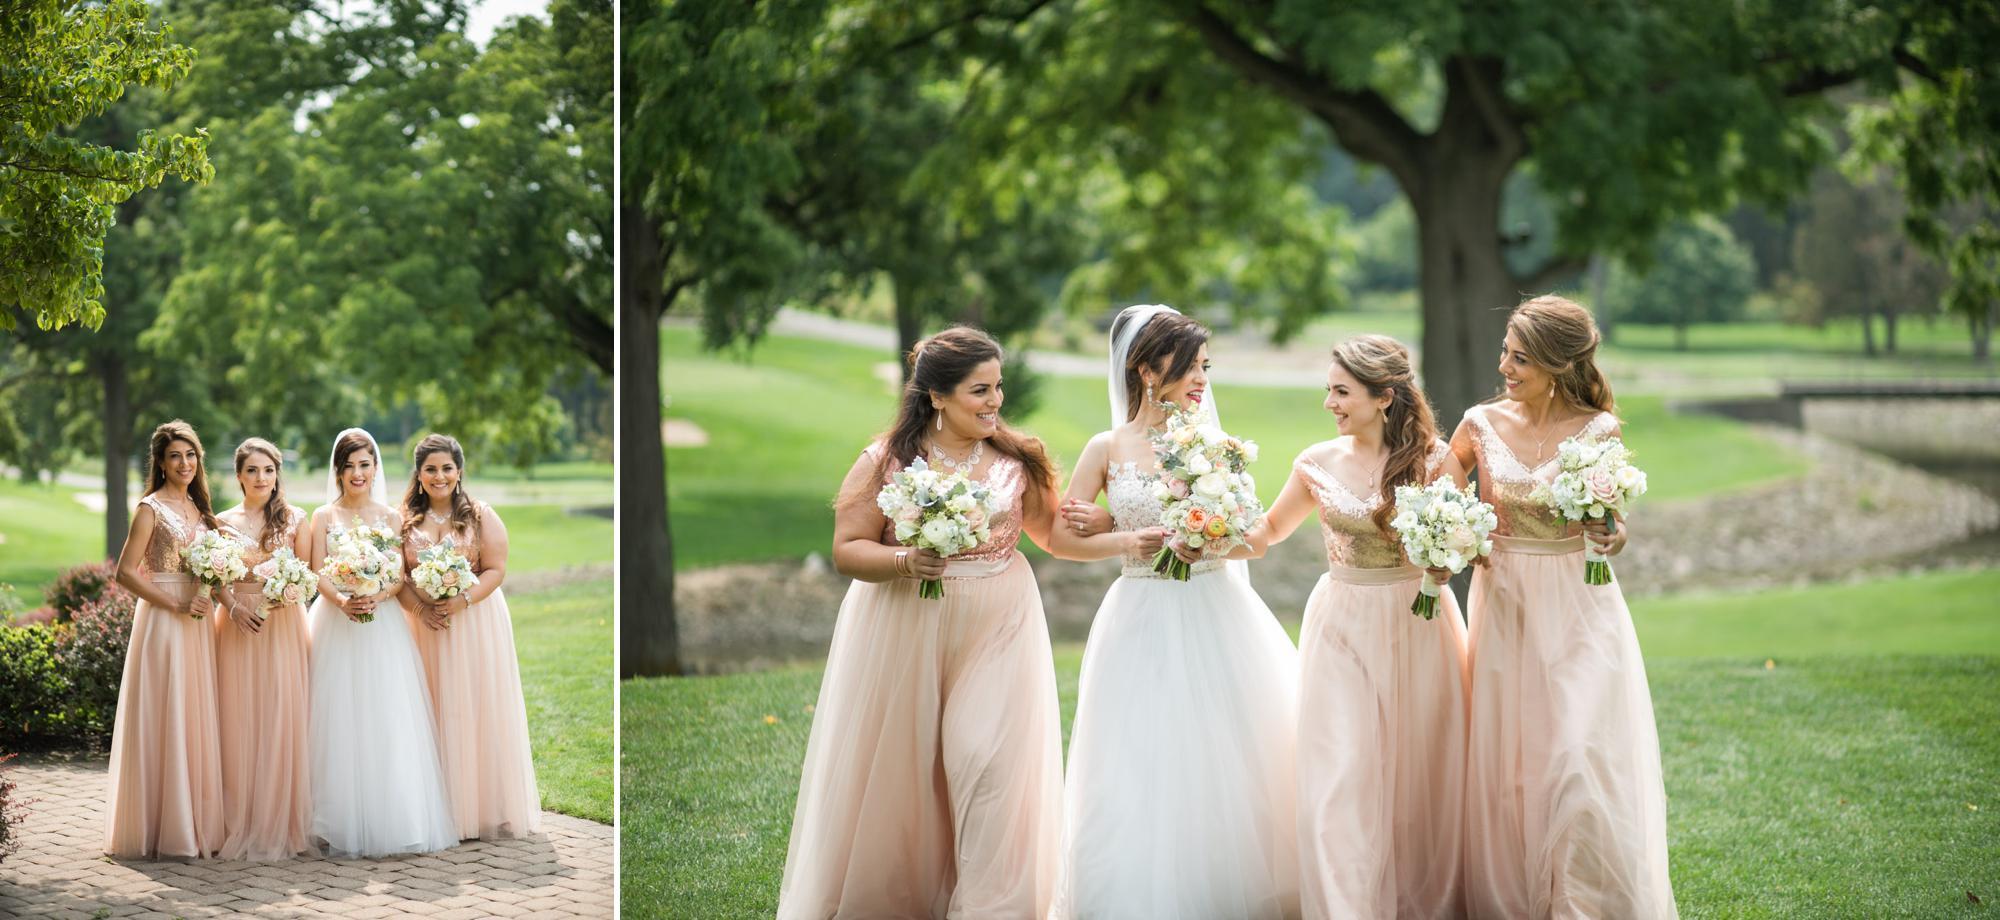 sylvania-country-club-wedding-photos-211.jpg